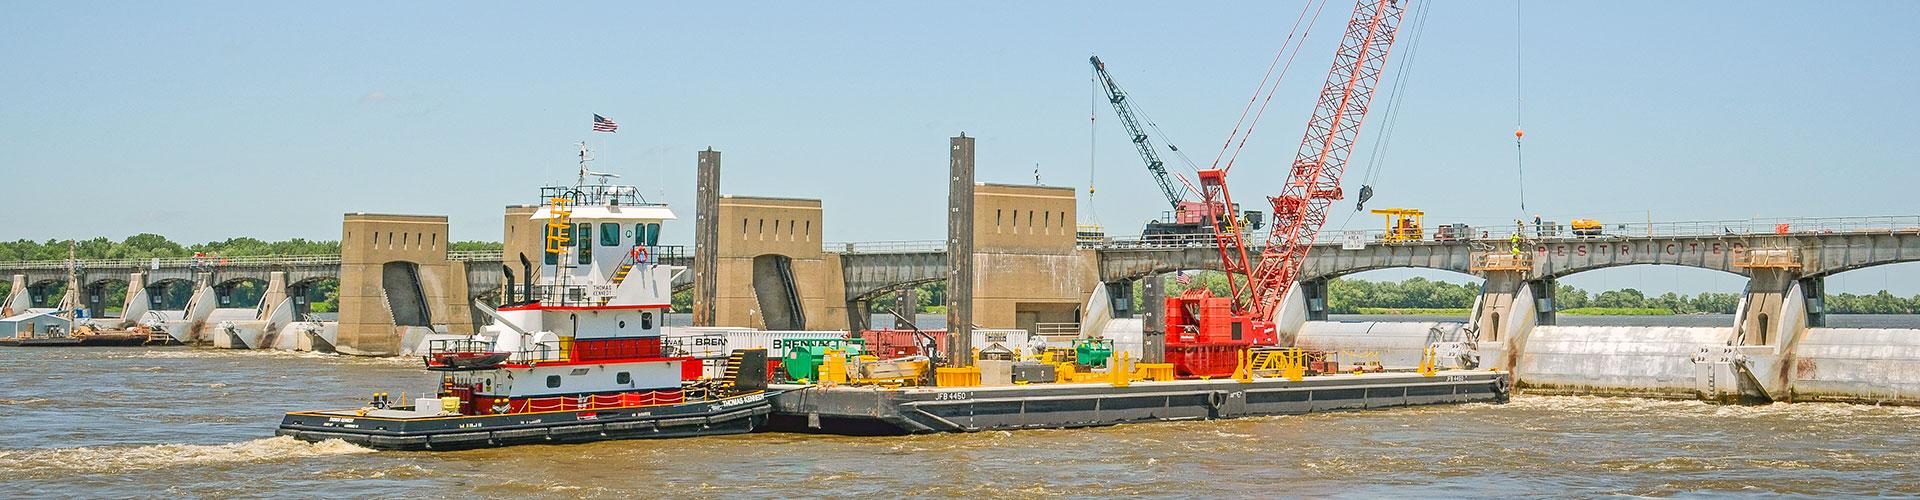 lock and dam construction, lock repairs, dam repairs, dam construction, mississippi river locks and dams, lock and dam 18, brennan, marine construction